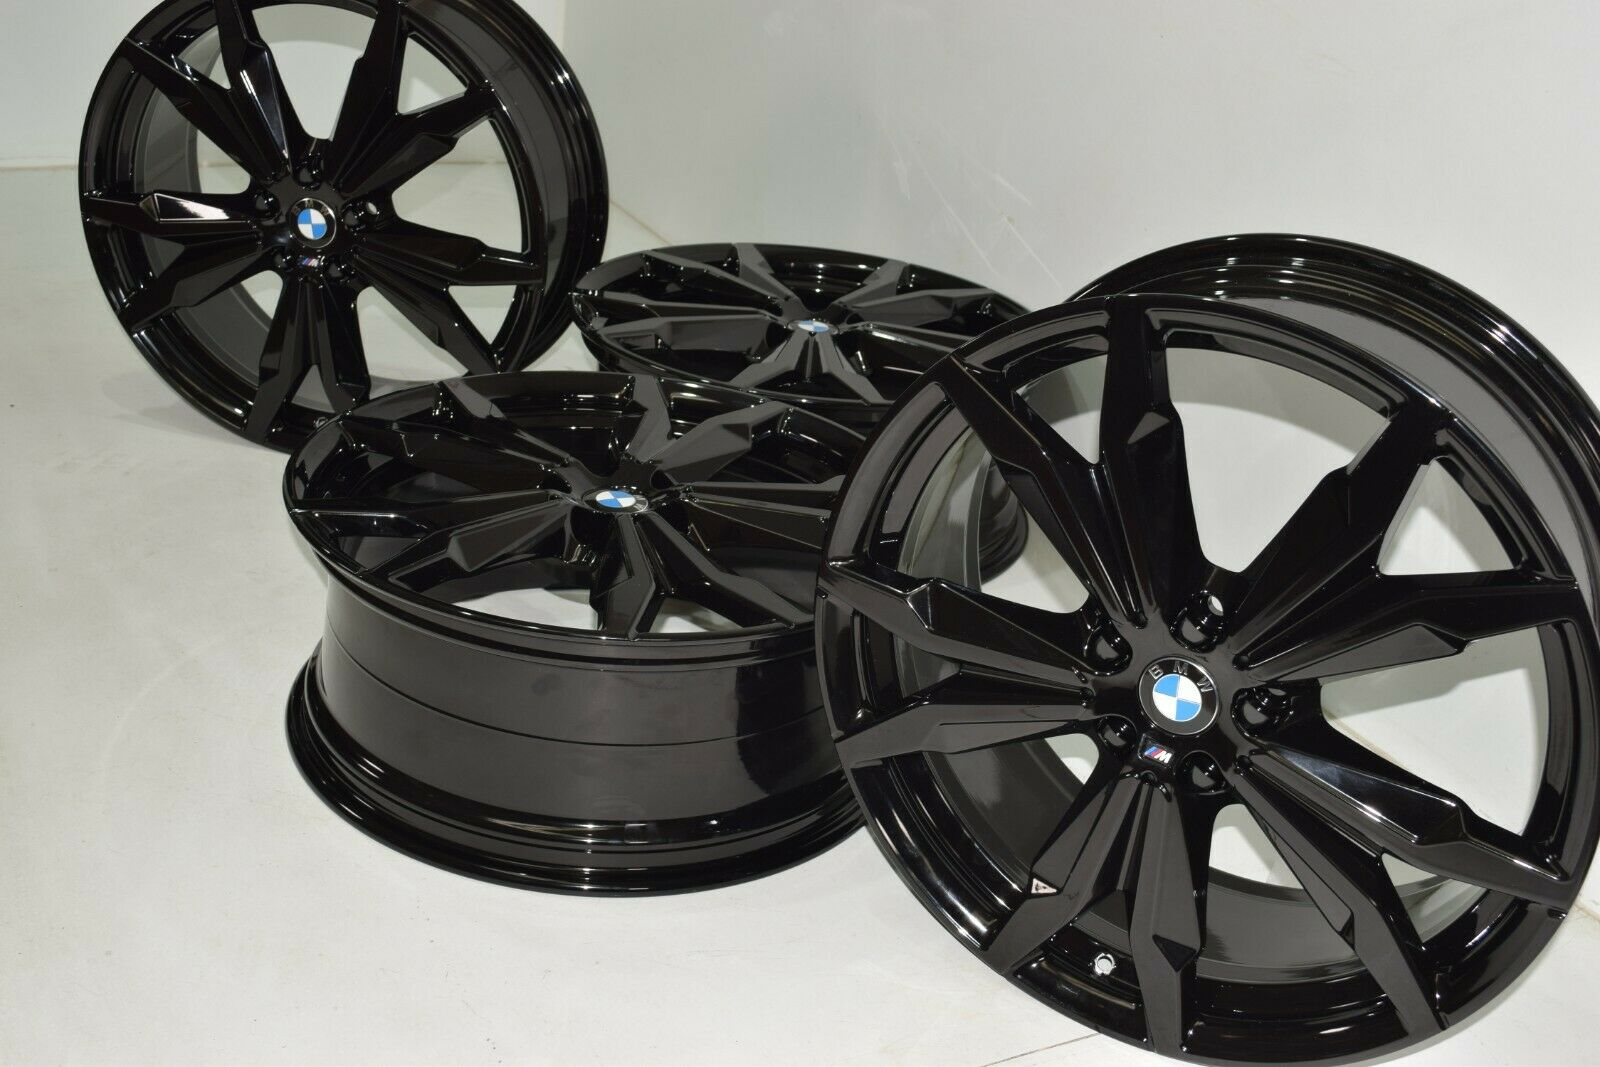 BMW X1 X2 2018 2019 2020 20″ Factory OEM Wheels Rims black 86480 36108008659